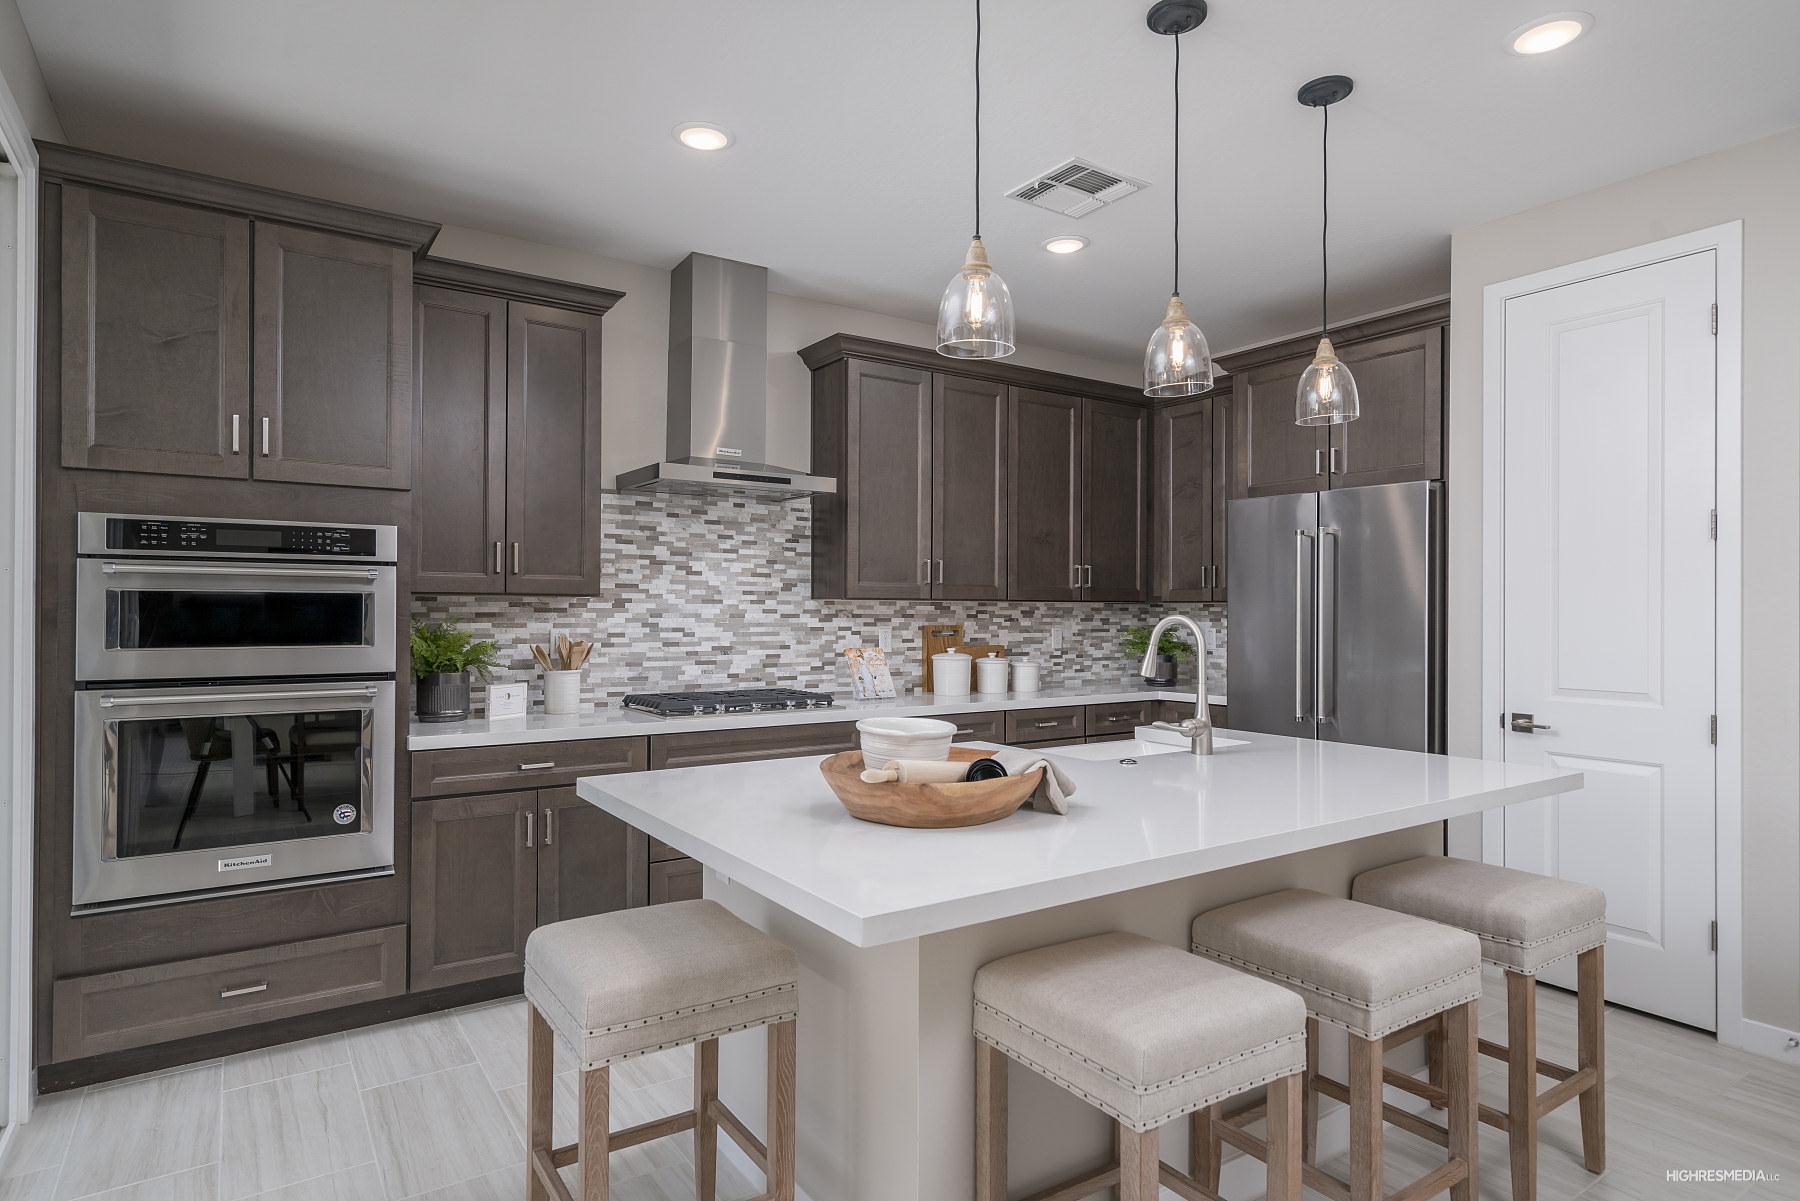 Kitchen featured in the Mirage By Landsea Homes in Phoenix-Mesa, AZ